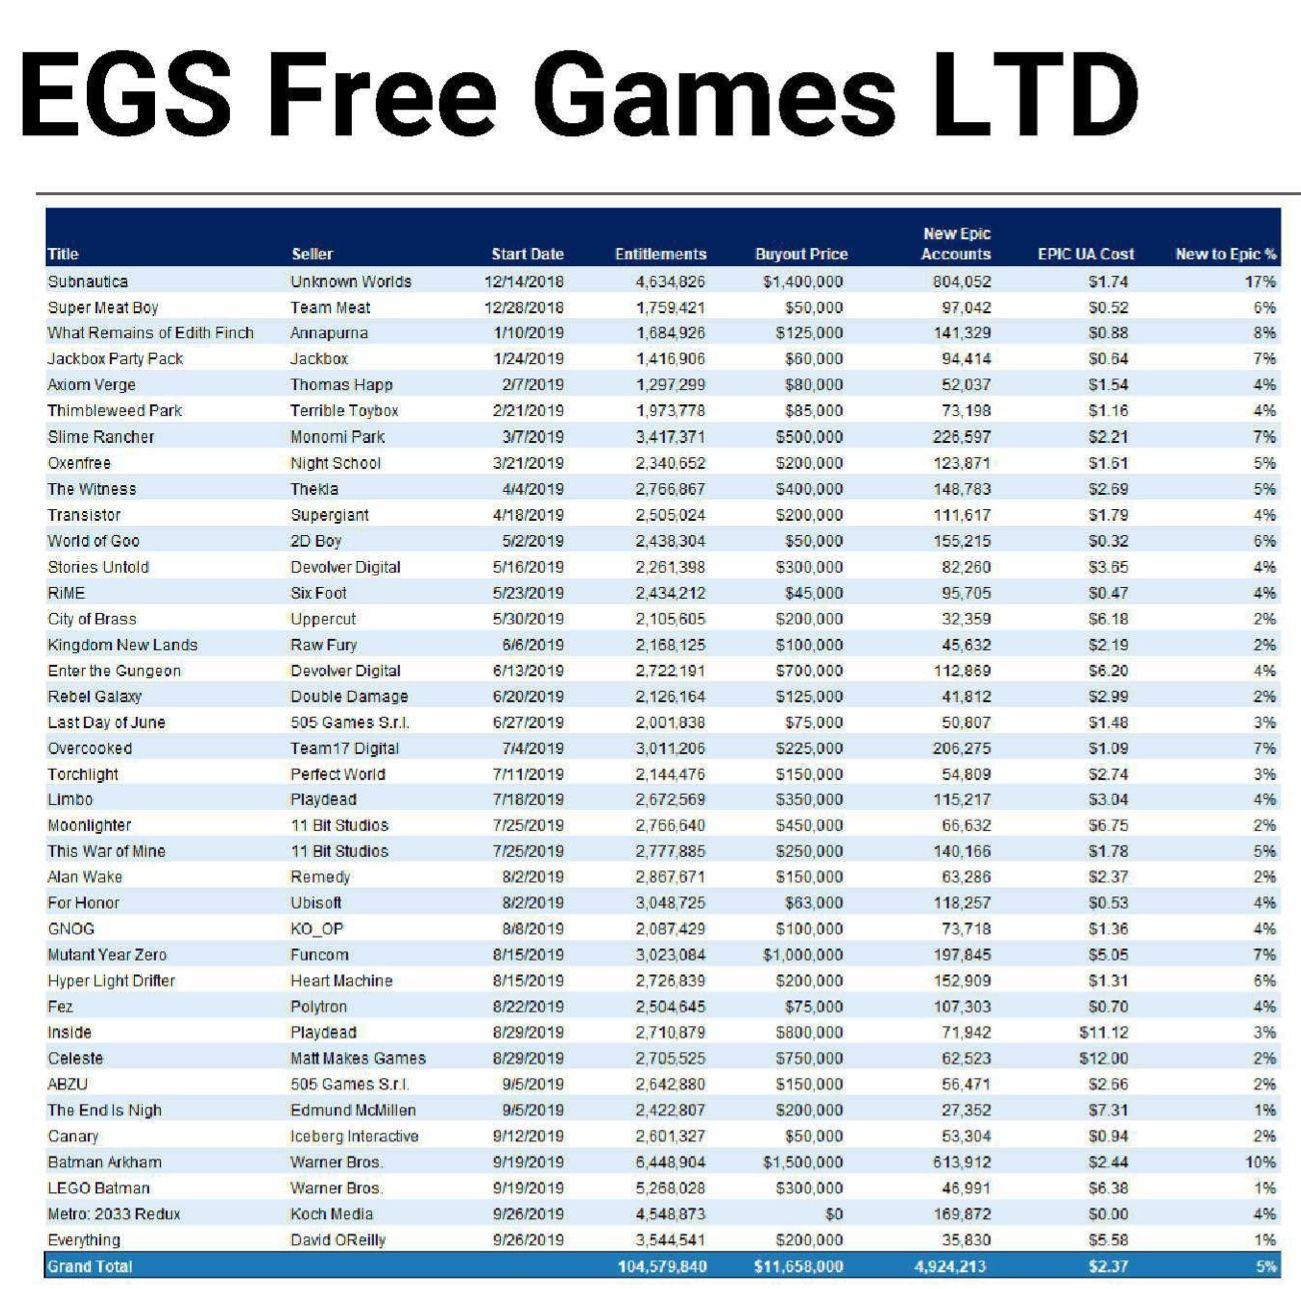 Epic免費遊戲花費